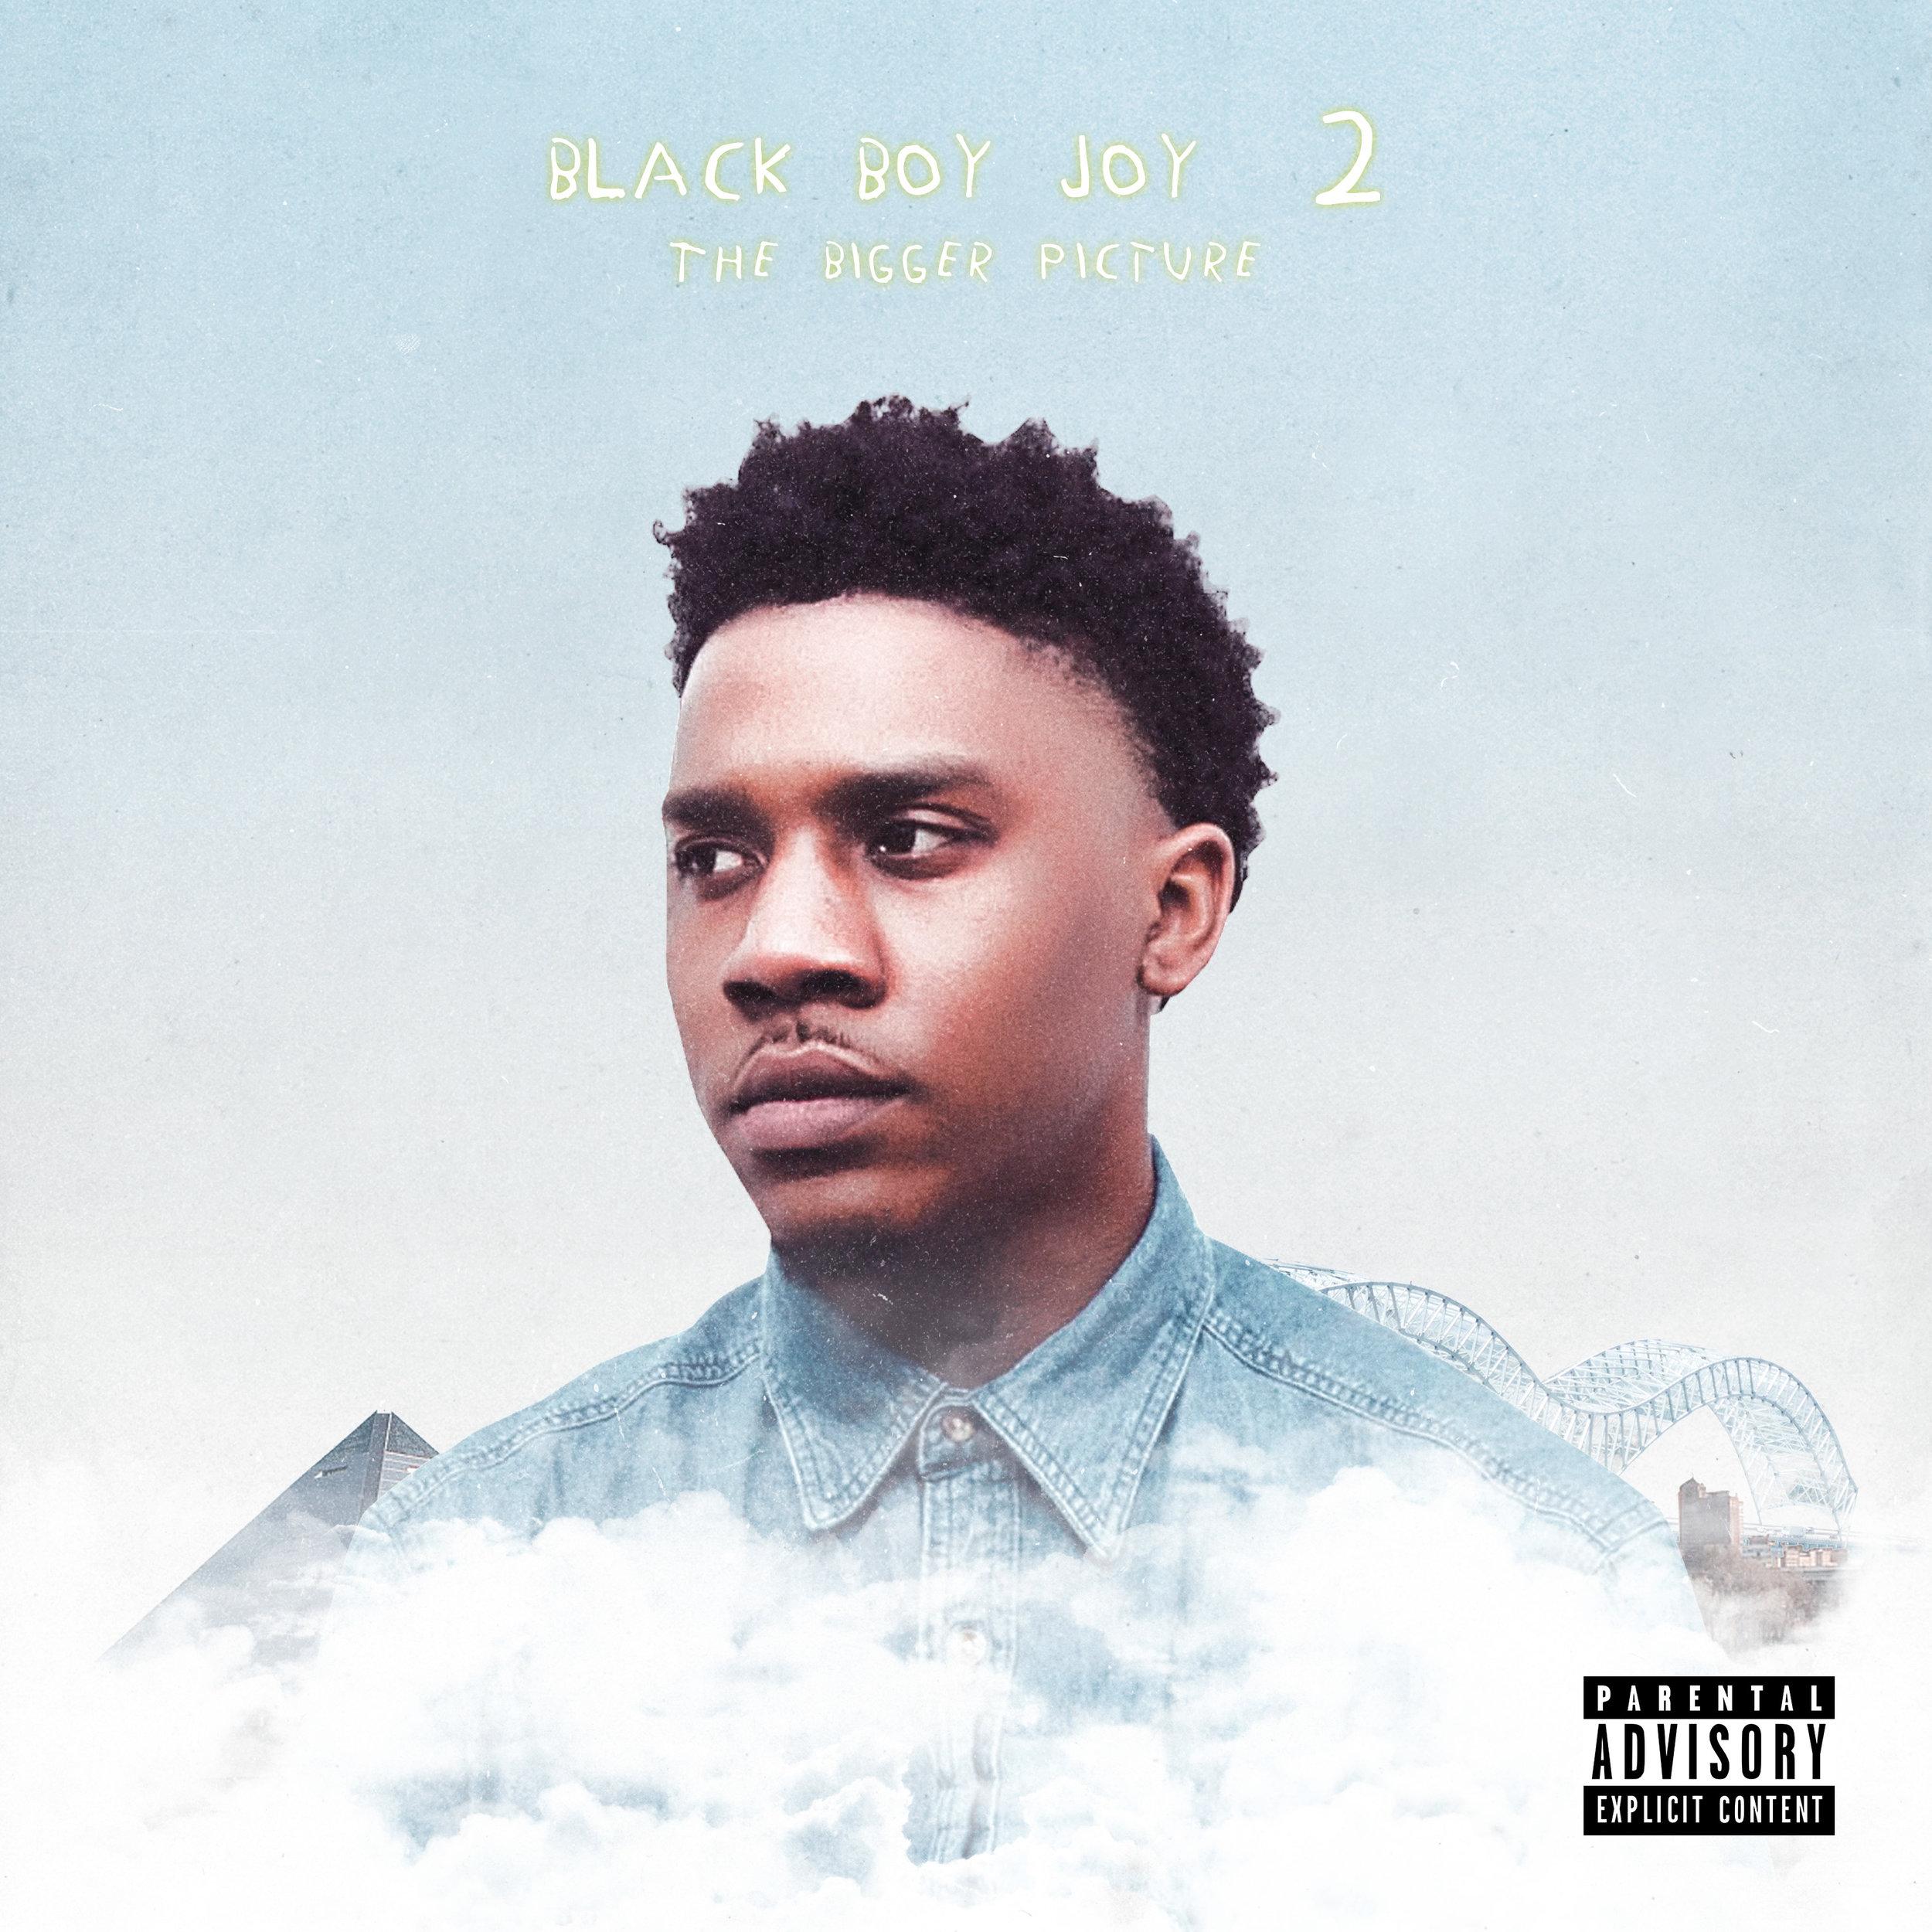 Black Boy Joy 2 revision 3.jpg